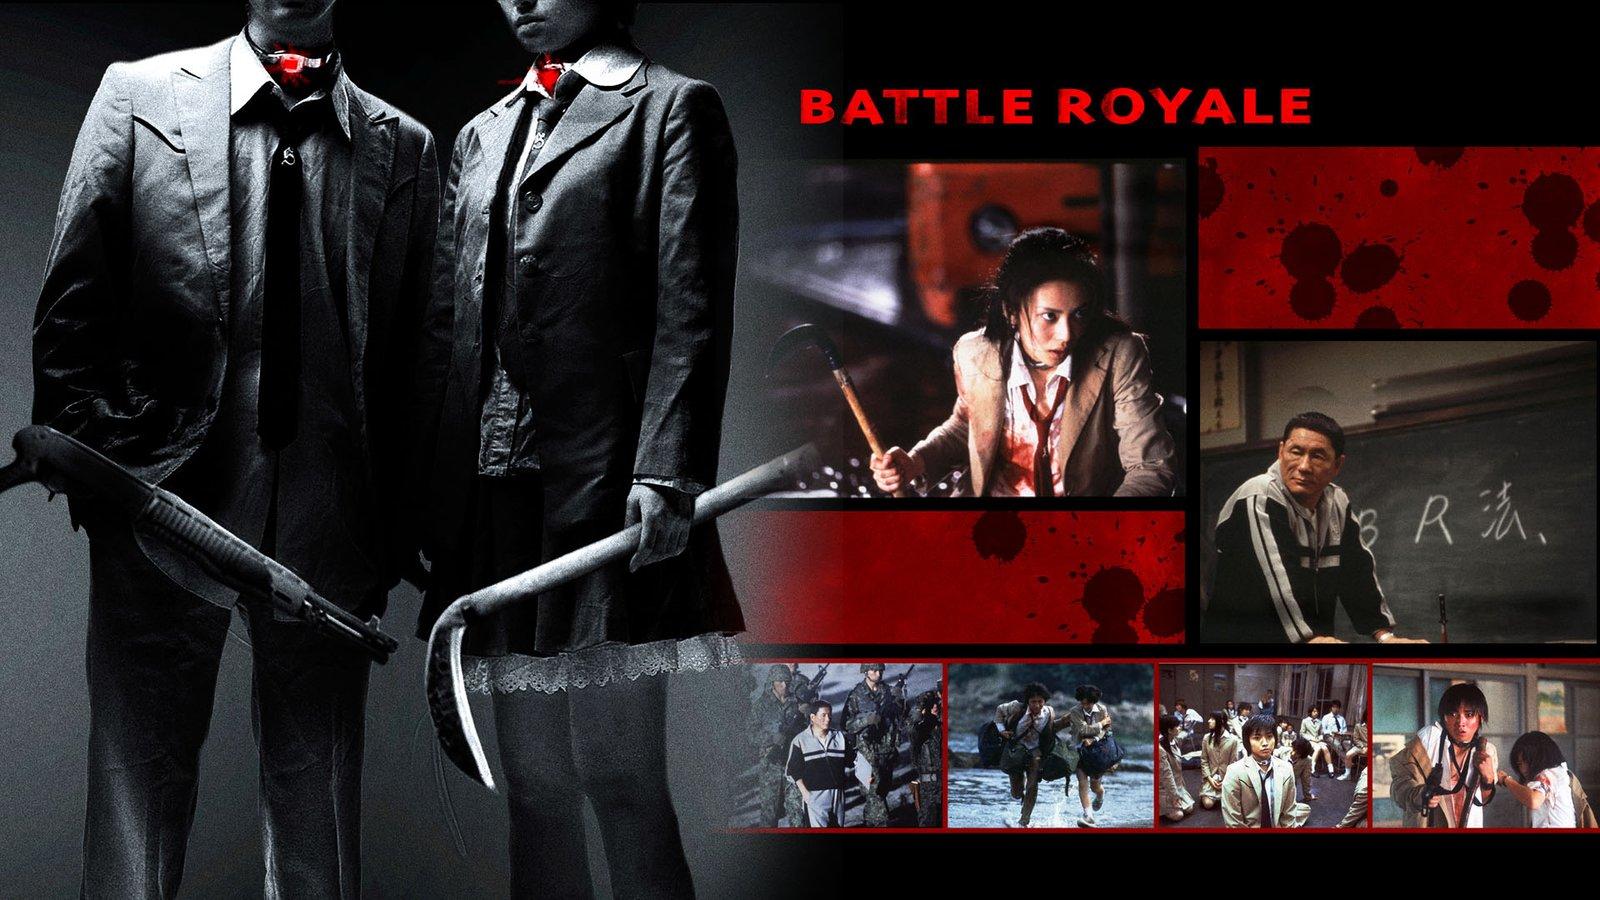 Battle Royale - Batoru rowaiaru